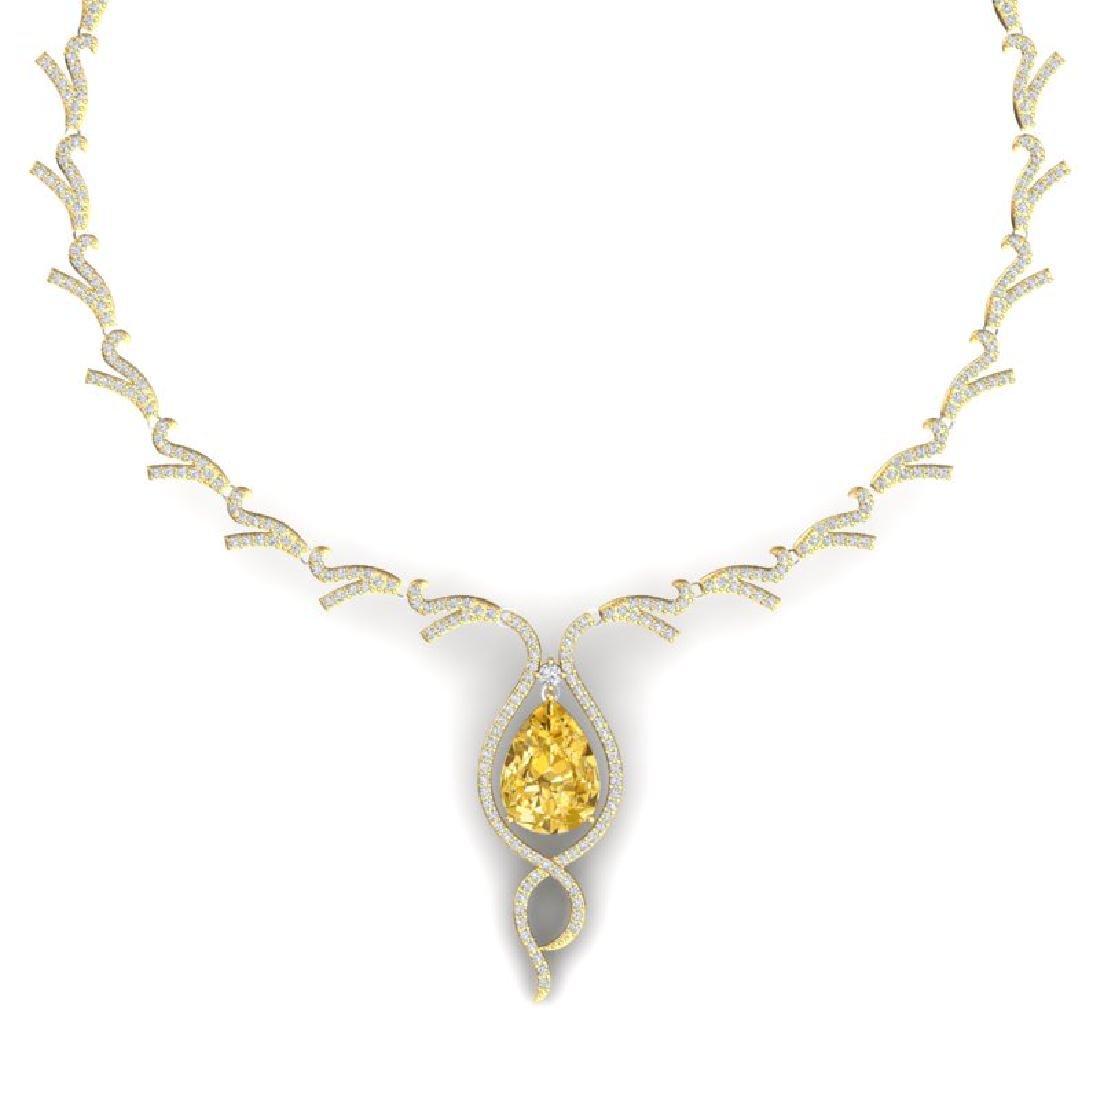 23.02 CTW Royalty Canary Citrine & VS Diamond Necklace